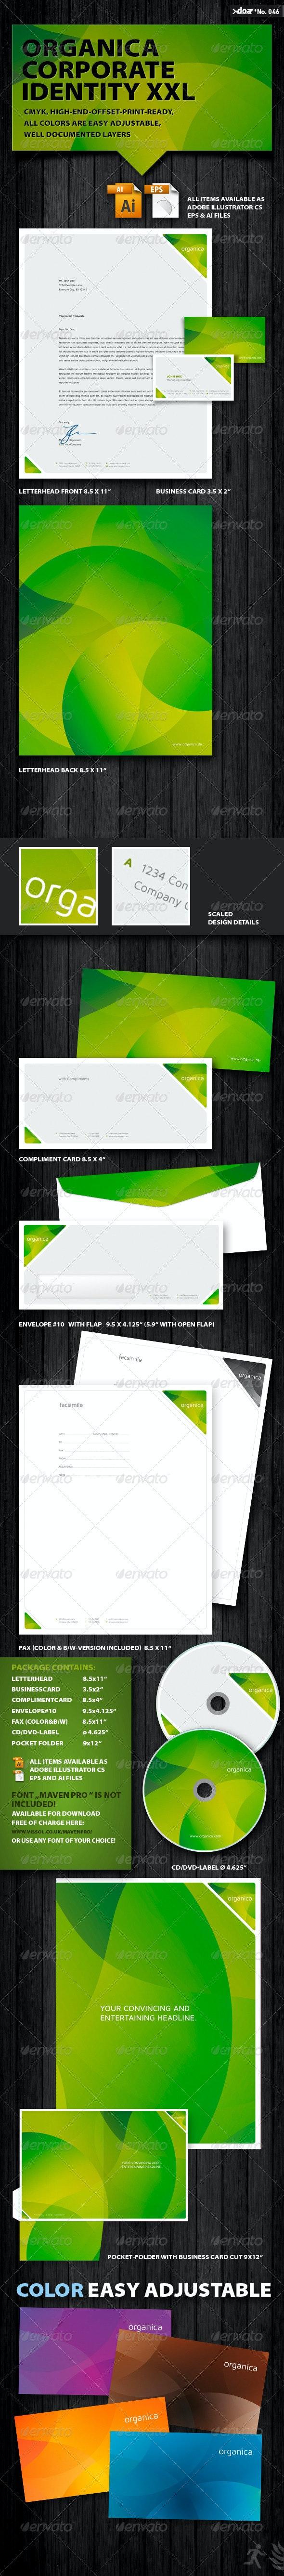 Organica Corporate Identity XXL - Stationery Print Templates